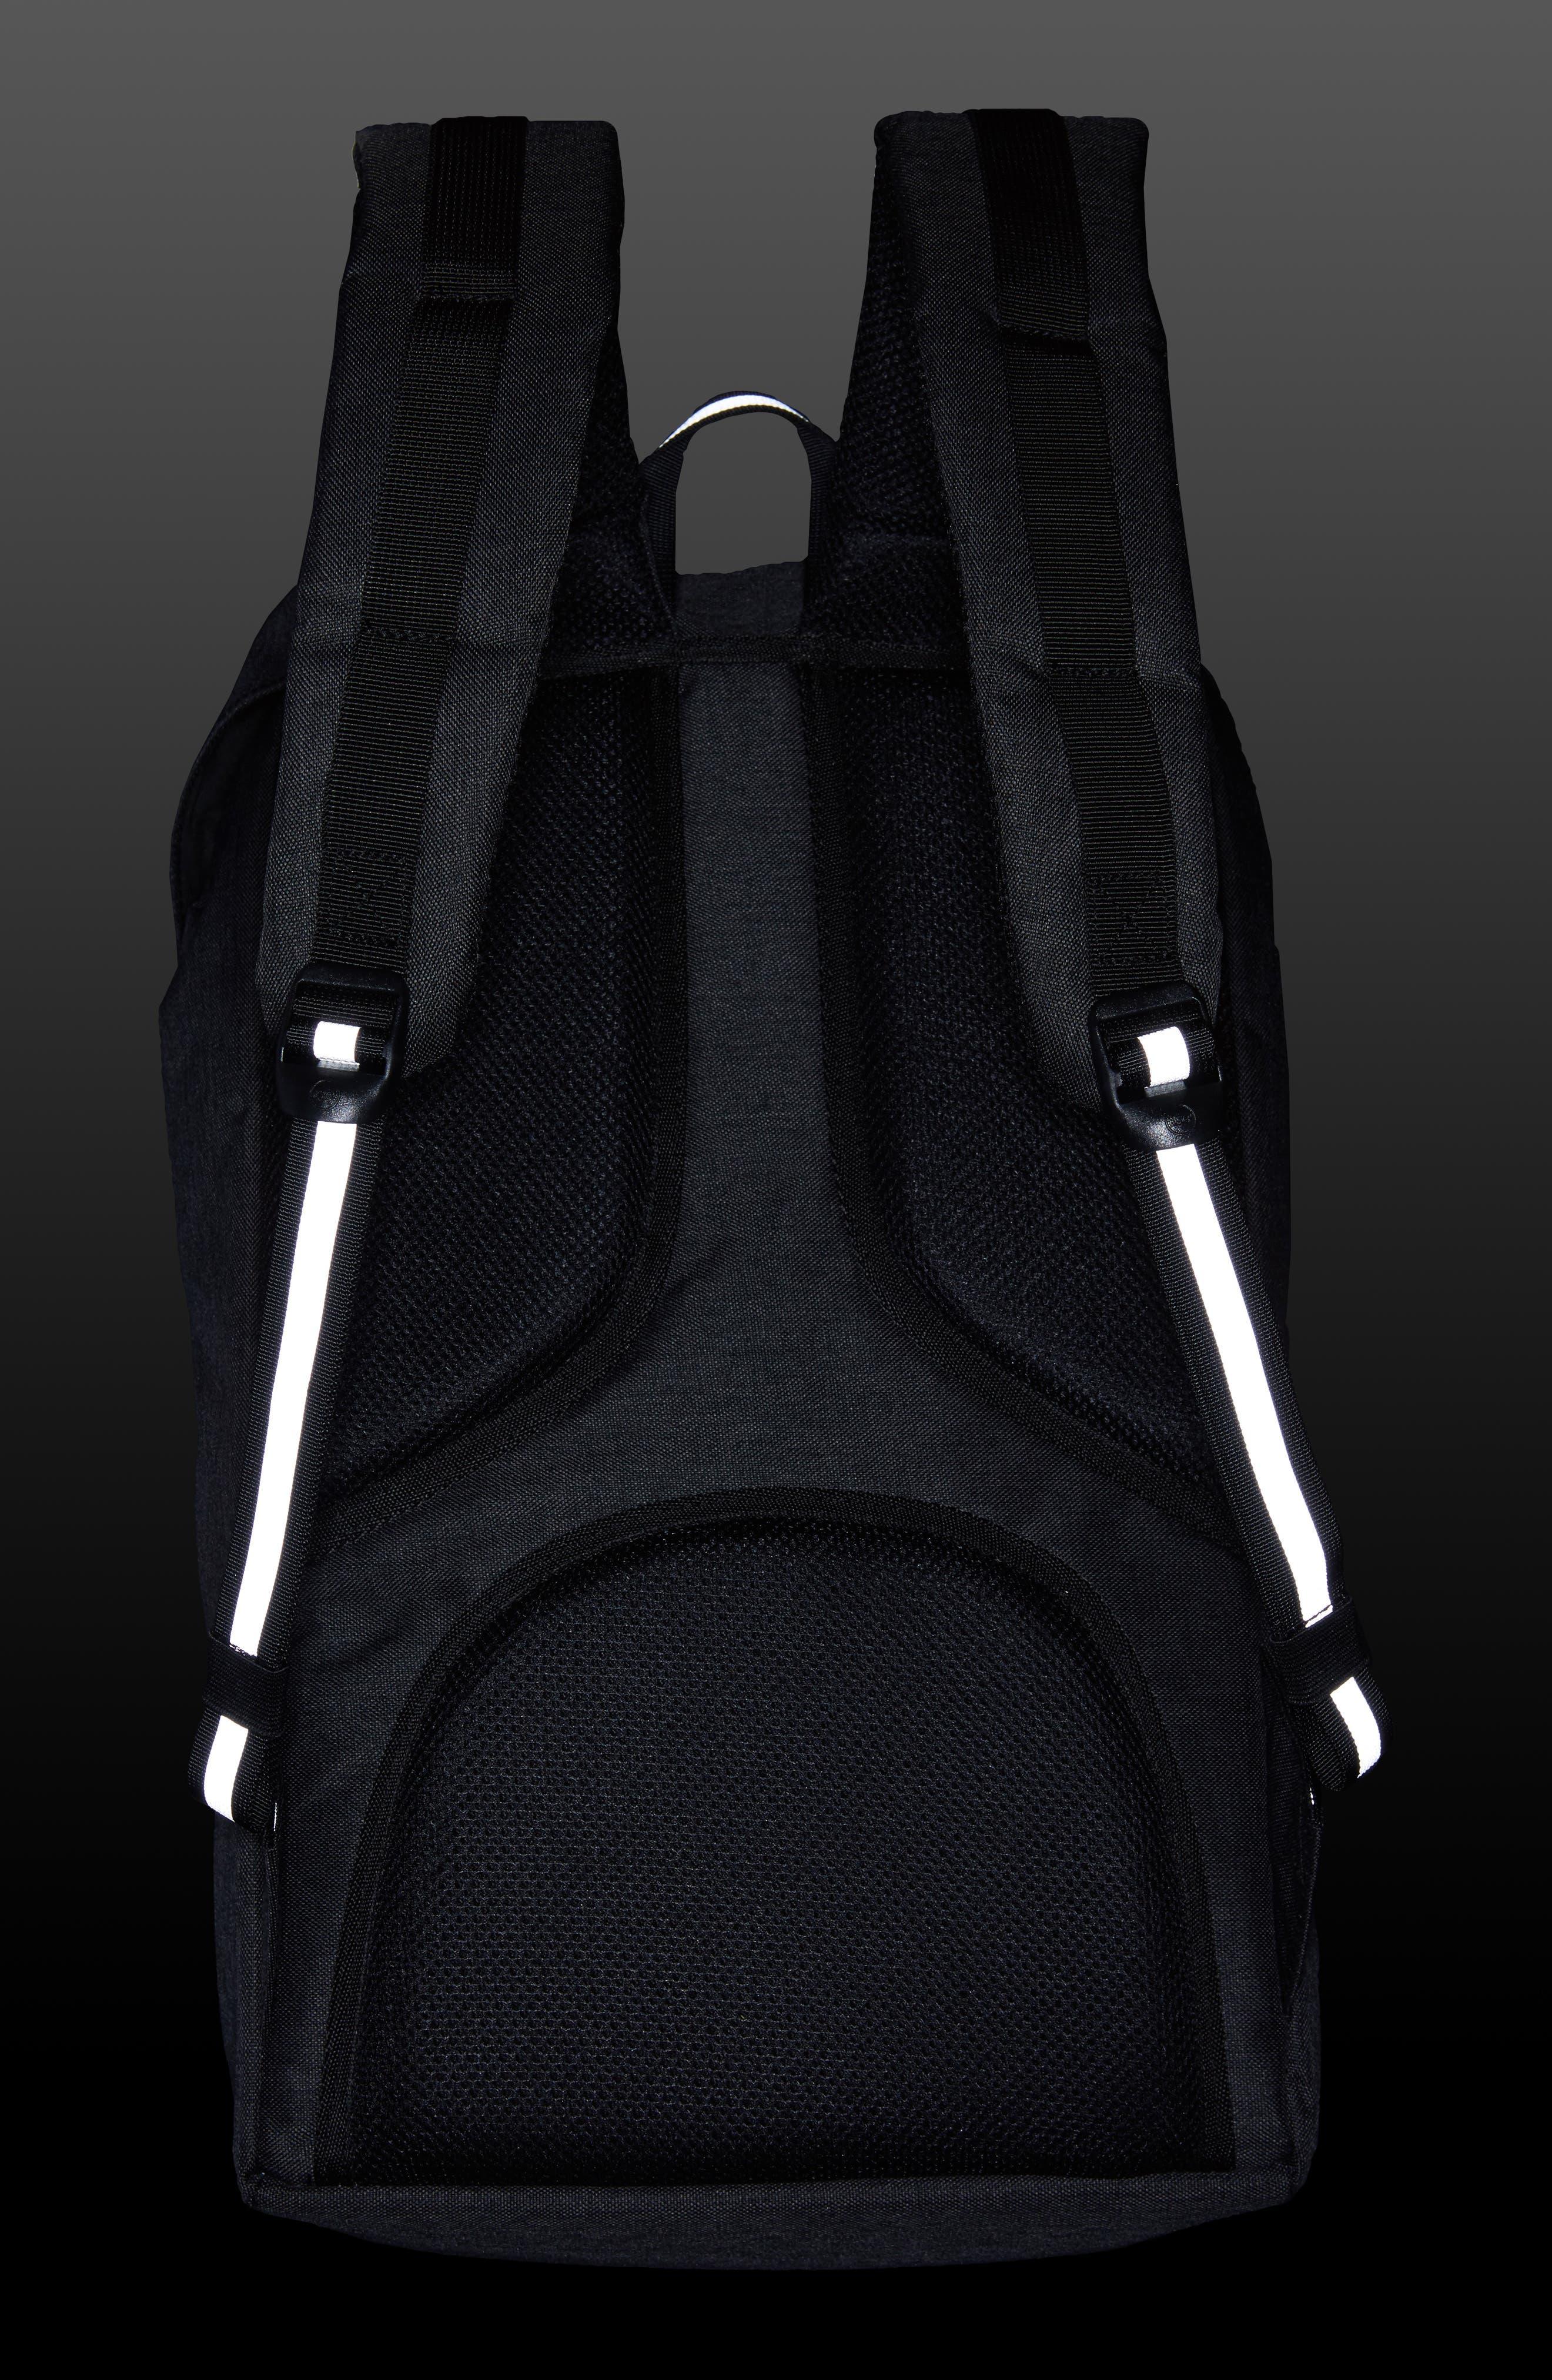 Little America - Reflective Backpack,                             Alternate thumbnail 2, color,                             Black Crosshatch/ Reflective